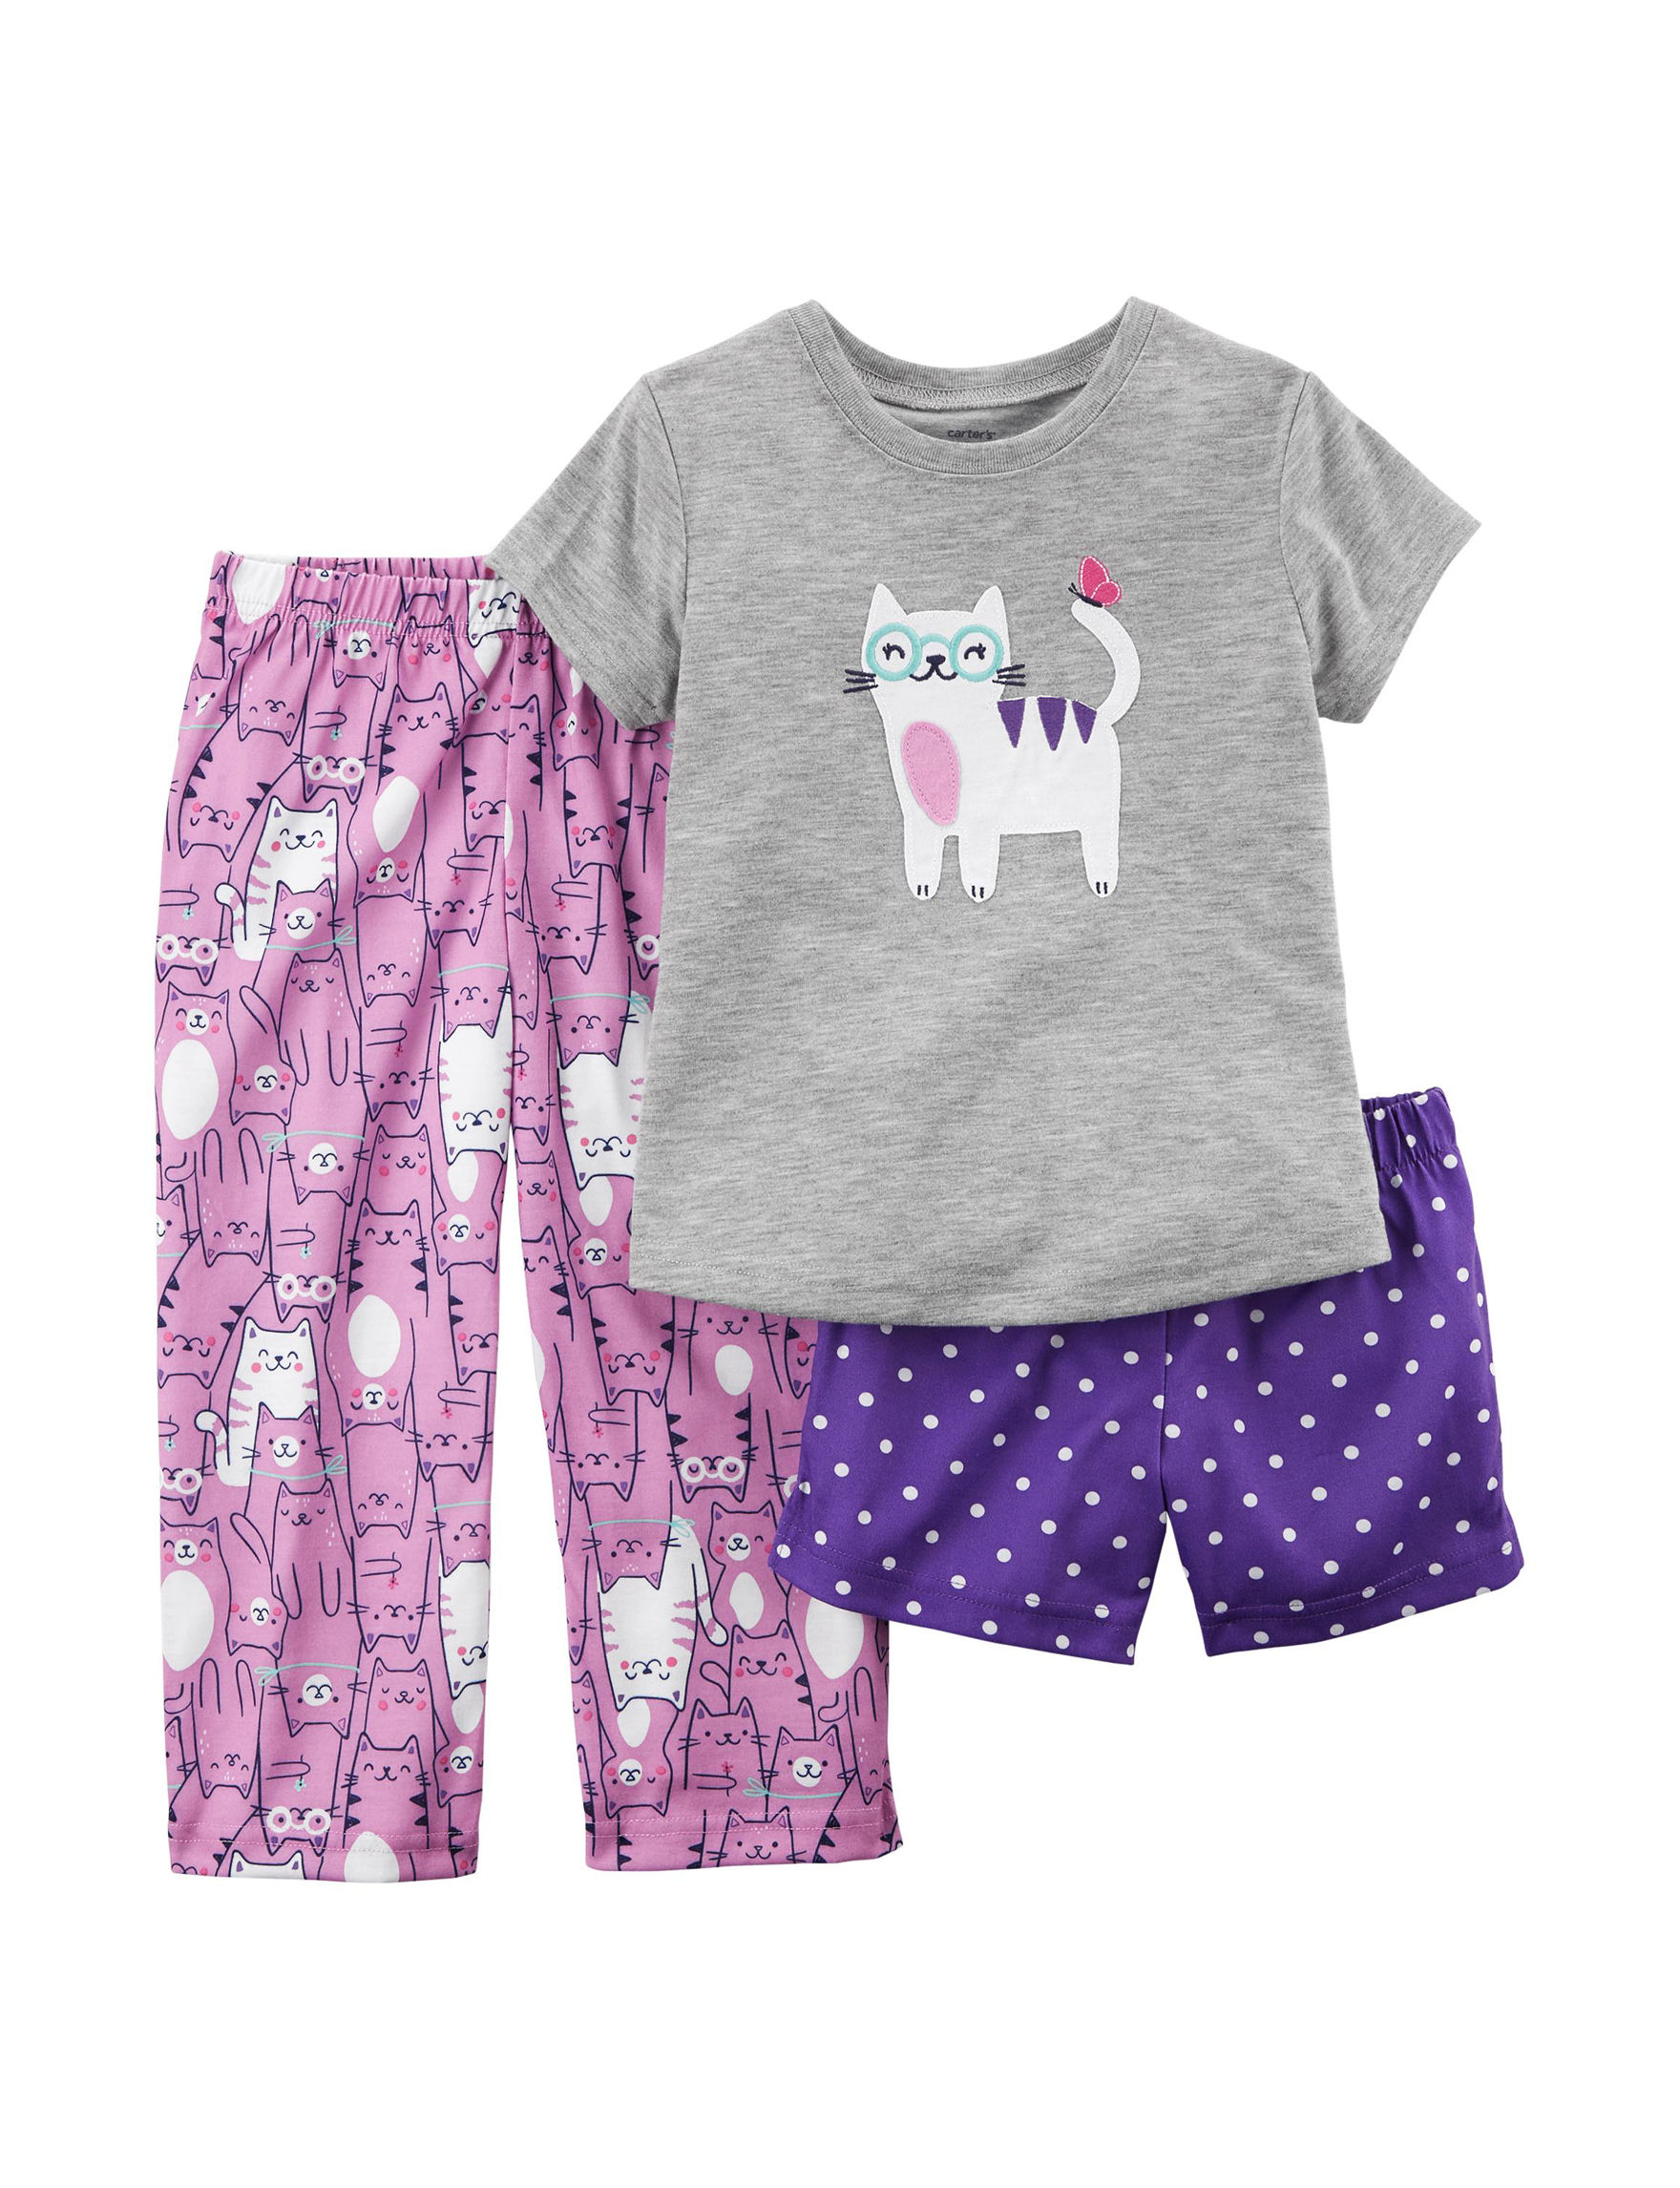 Carter's Purple / Grey Pajama Sets